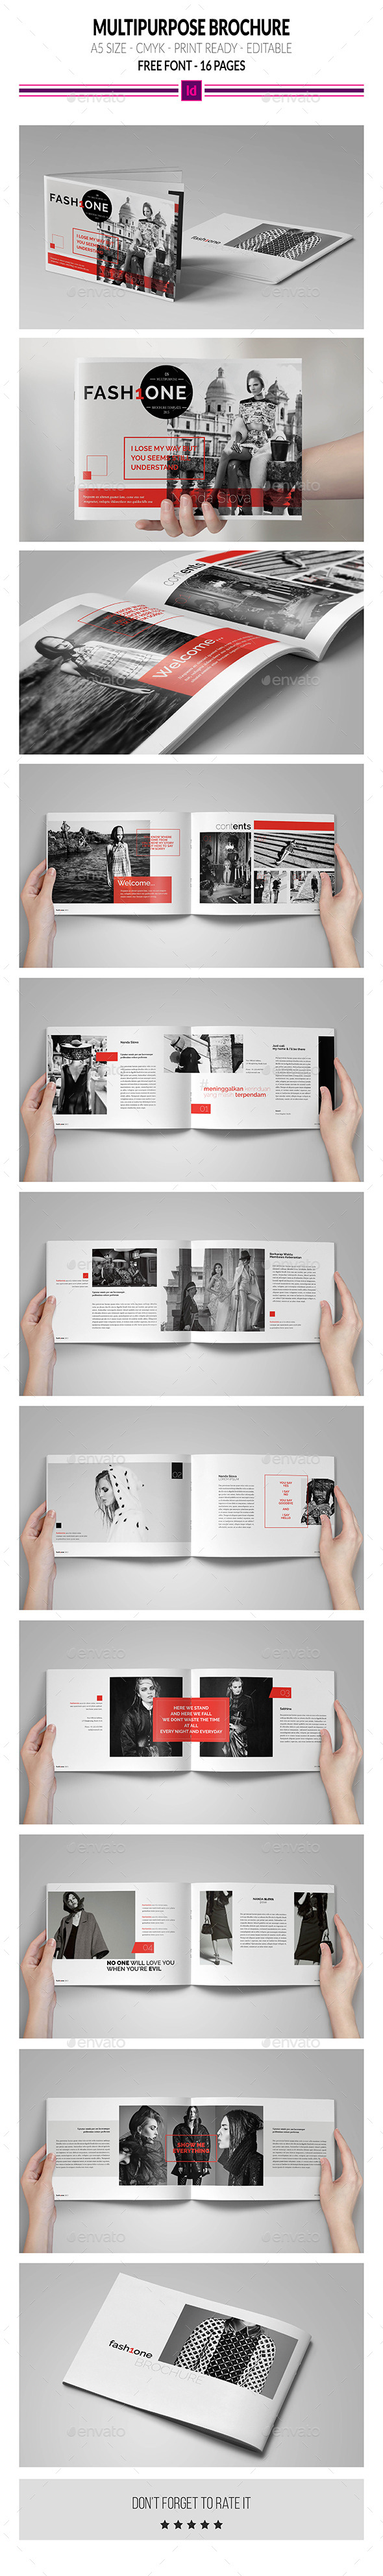 Multipurpose Brochure Template - Portfolio Brochures